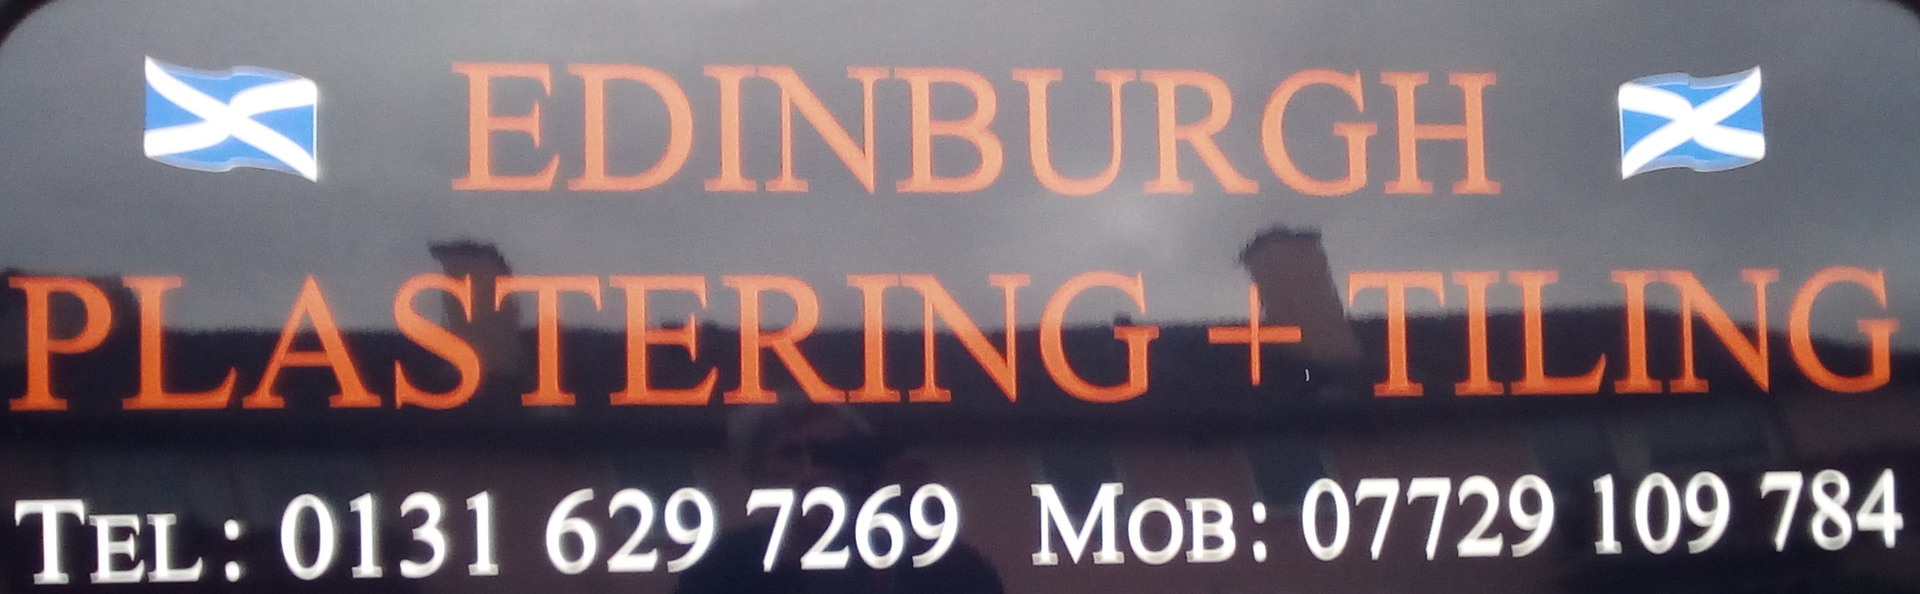 Edinburgh Plastering & Tiling